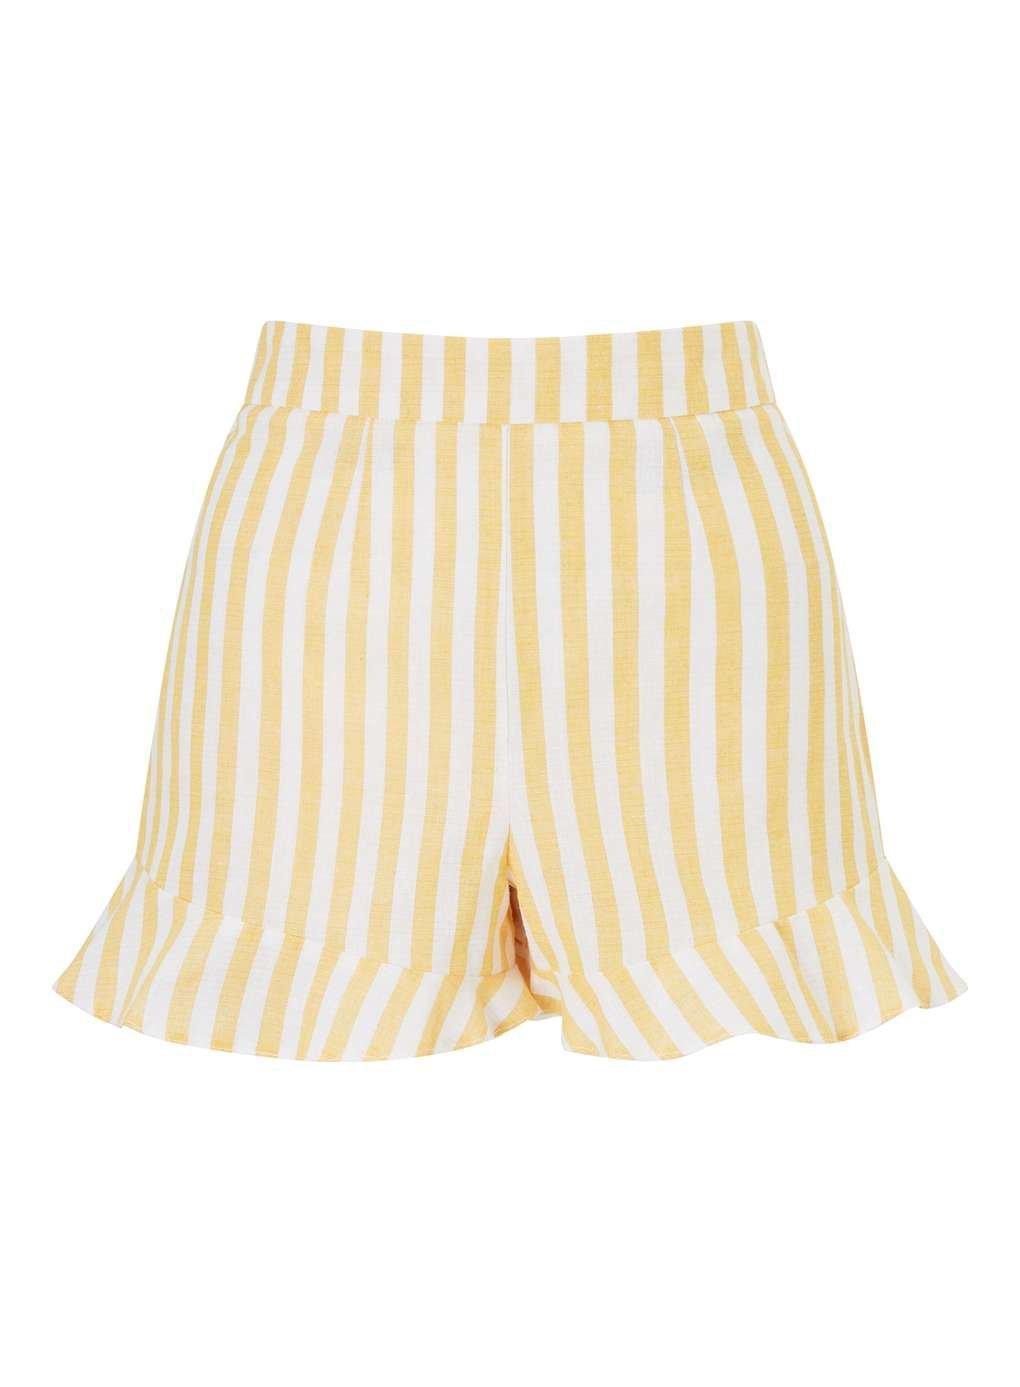 PETITE Yellow Striped Frill Hem Shorts - Holiday Shop - Clothing - Miss Selfridge